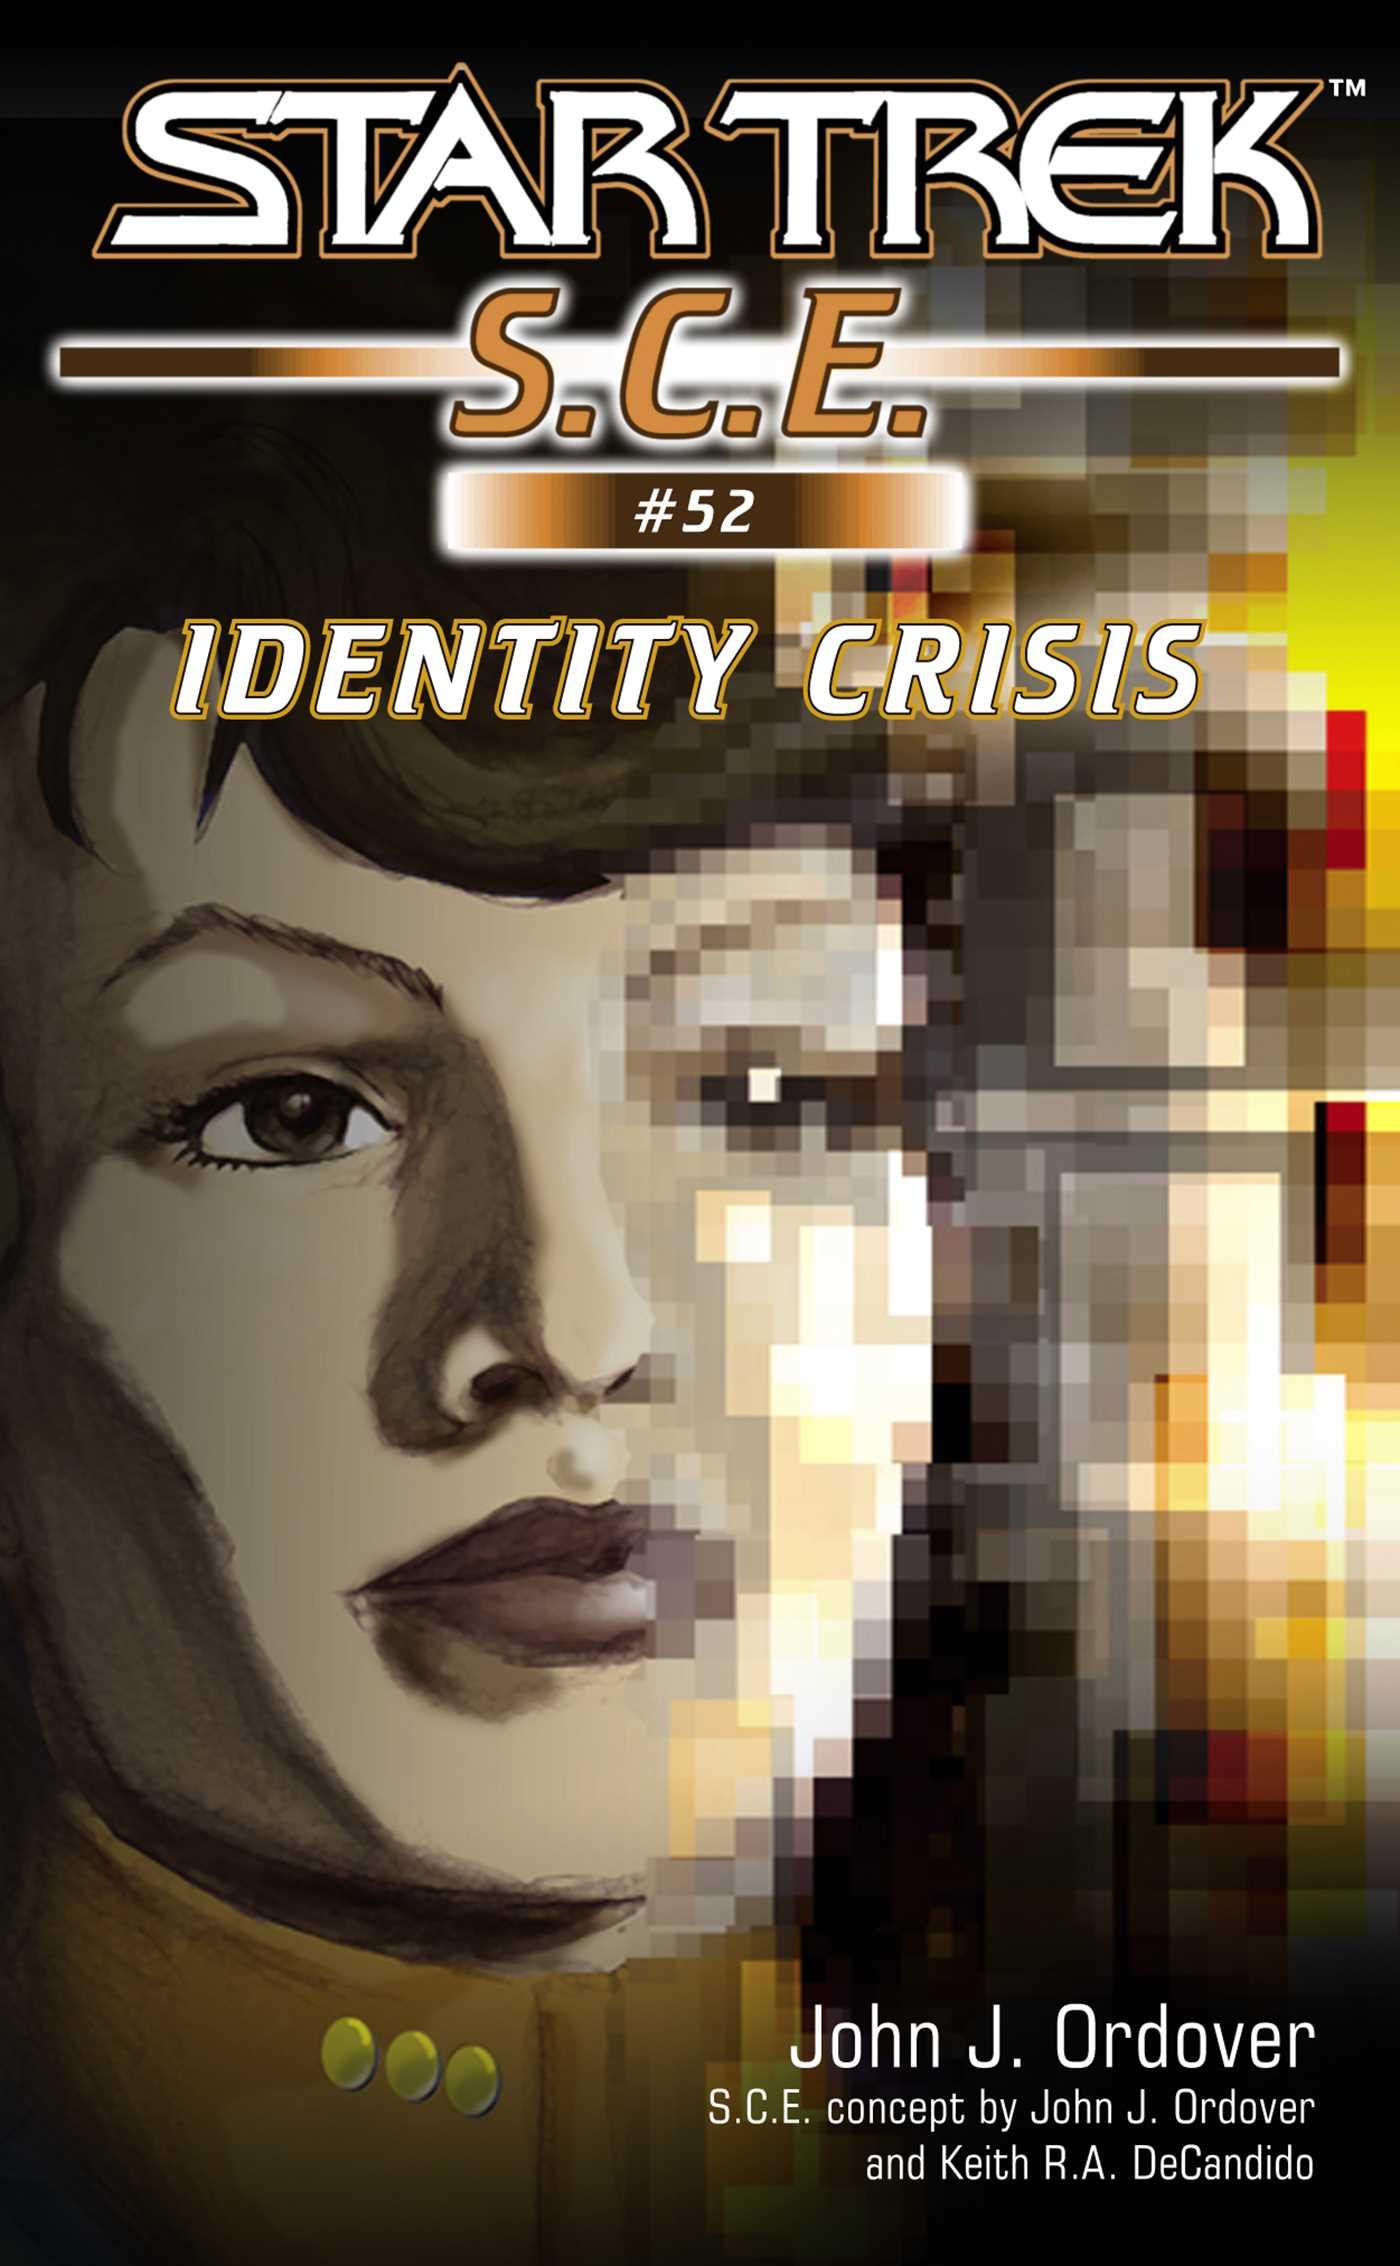 Star trek identity crisis 9780743496841 hr